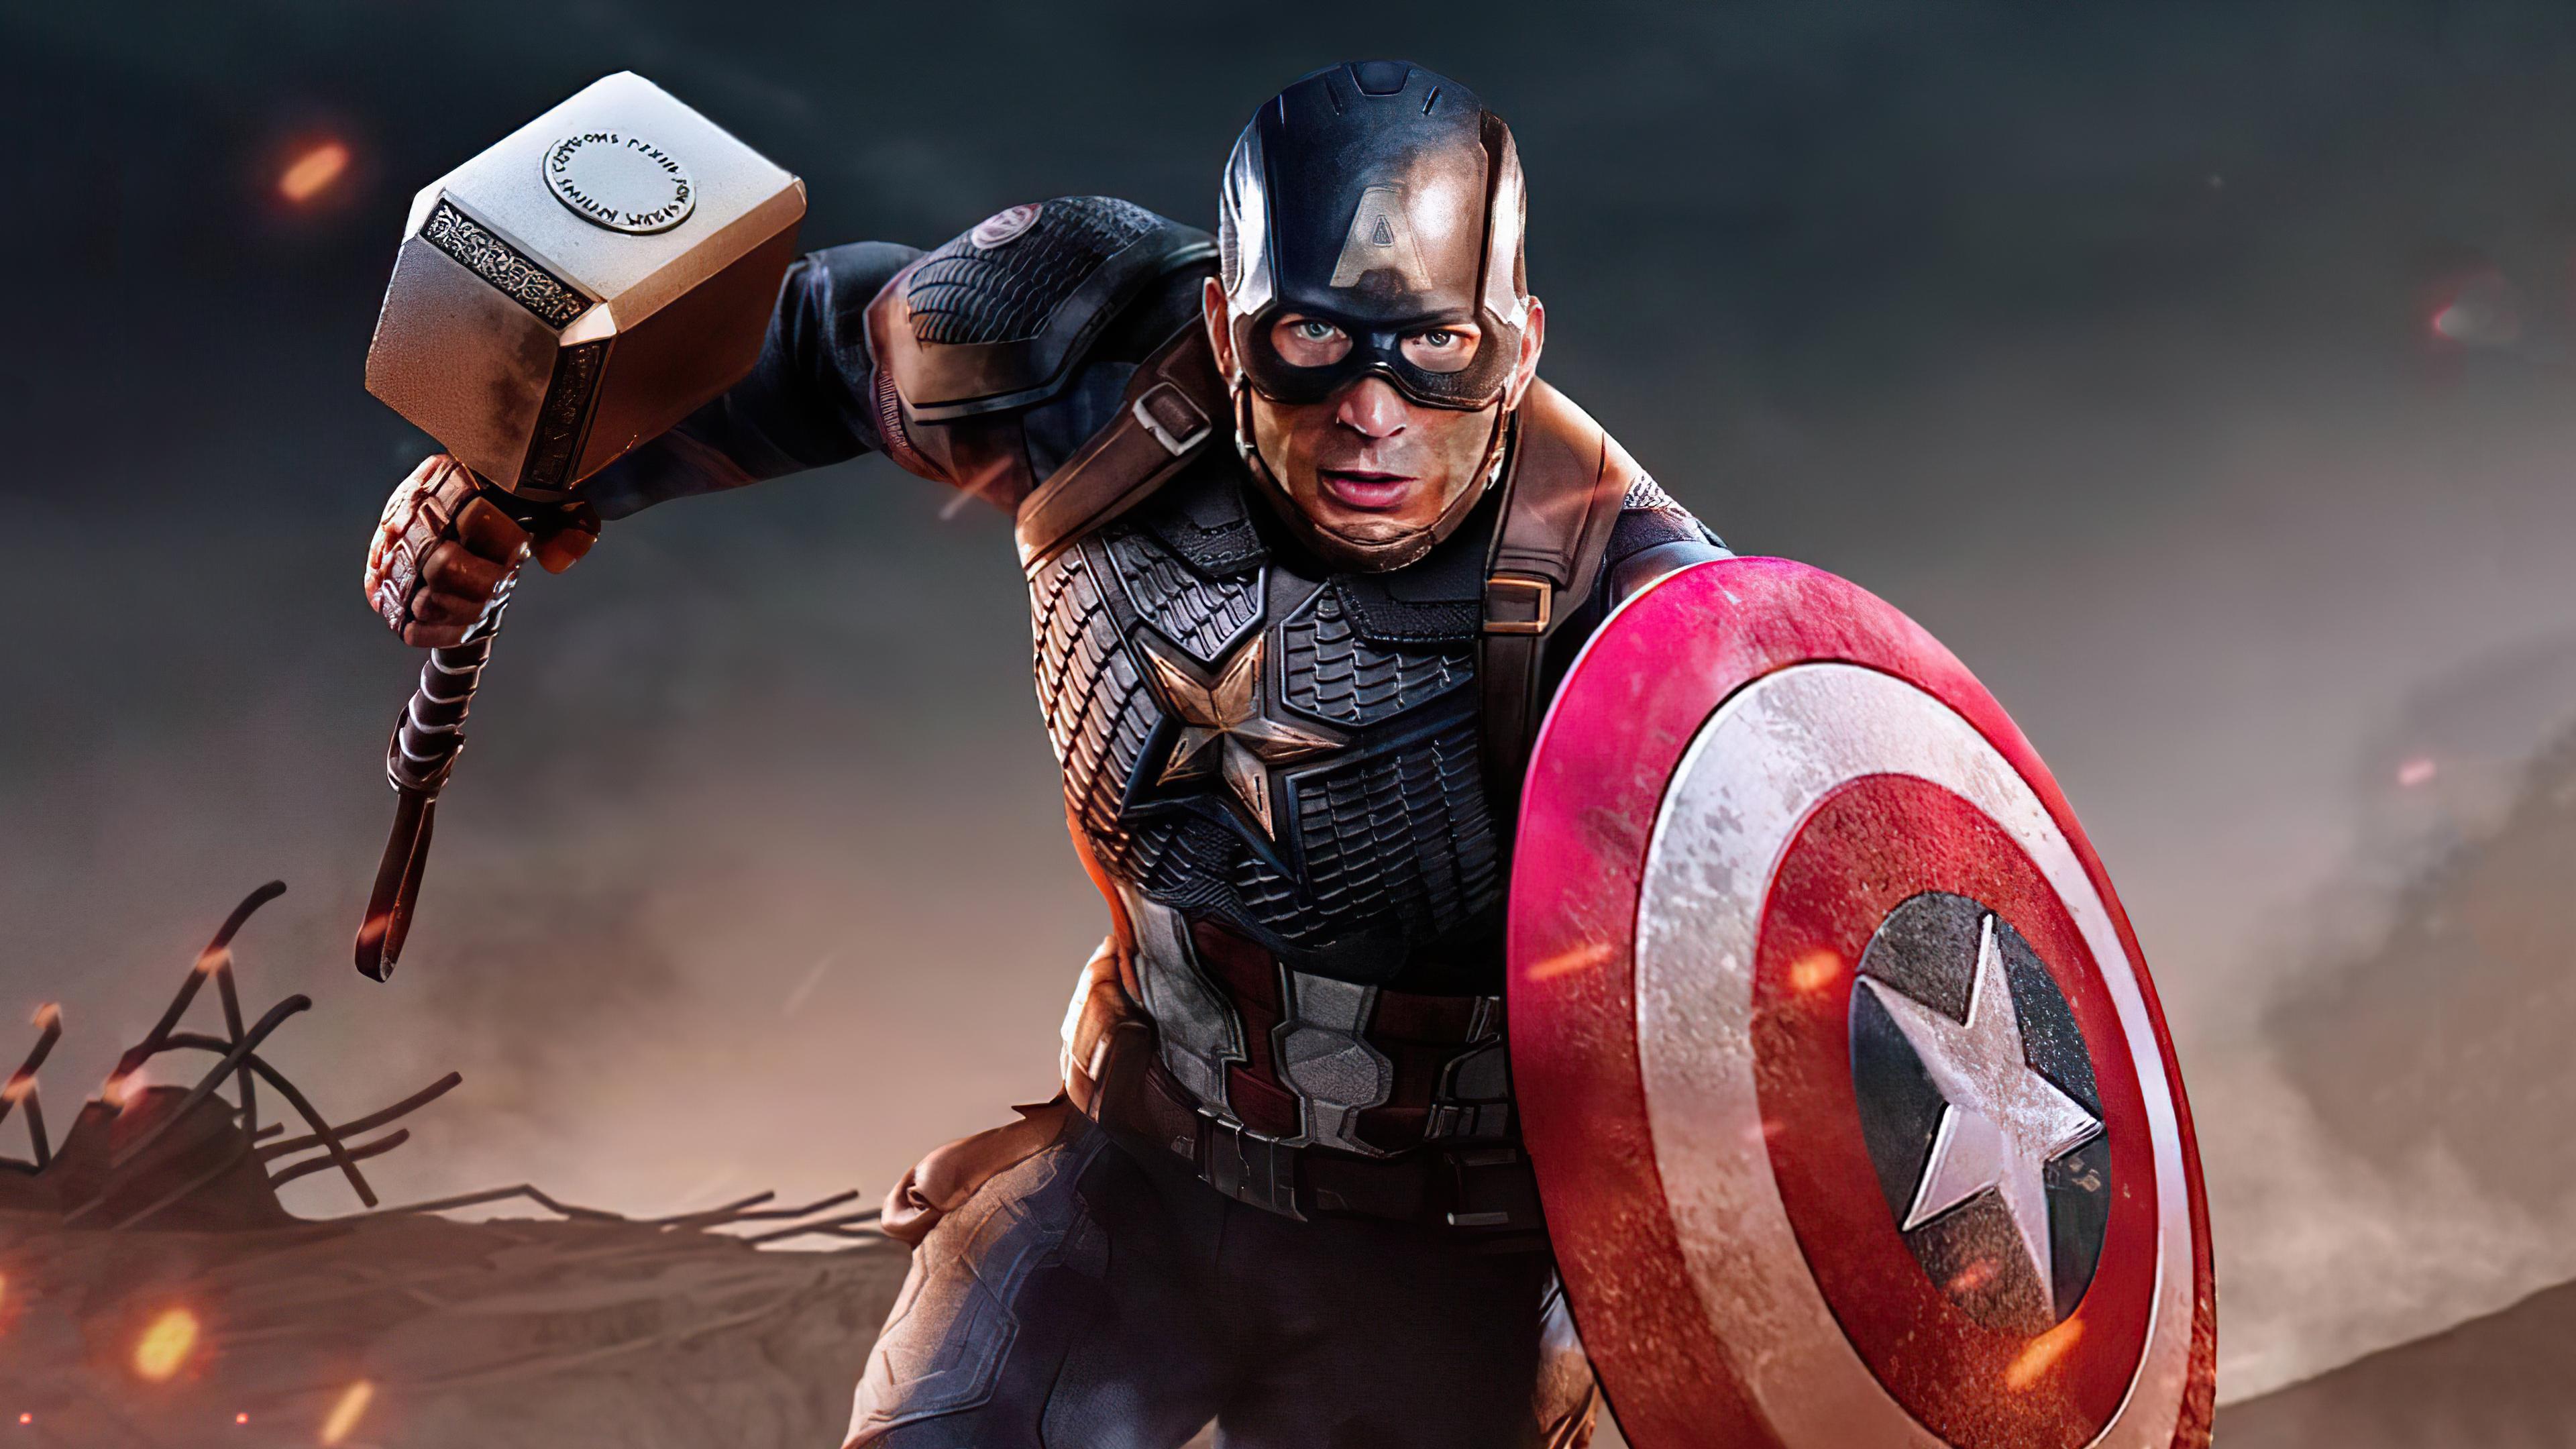 Captain America 2020 4k, HD Superheroes, 4k Wallpapers ...